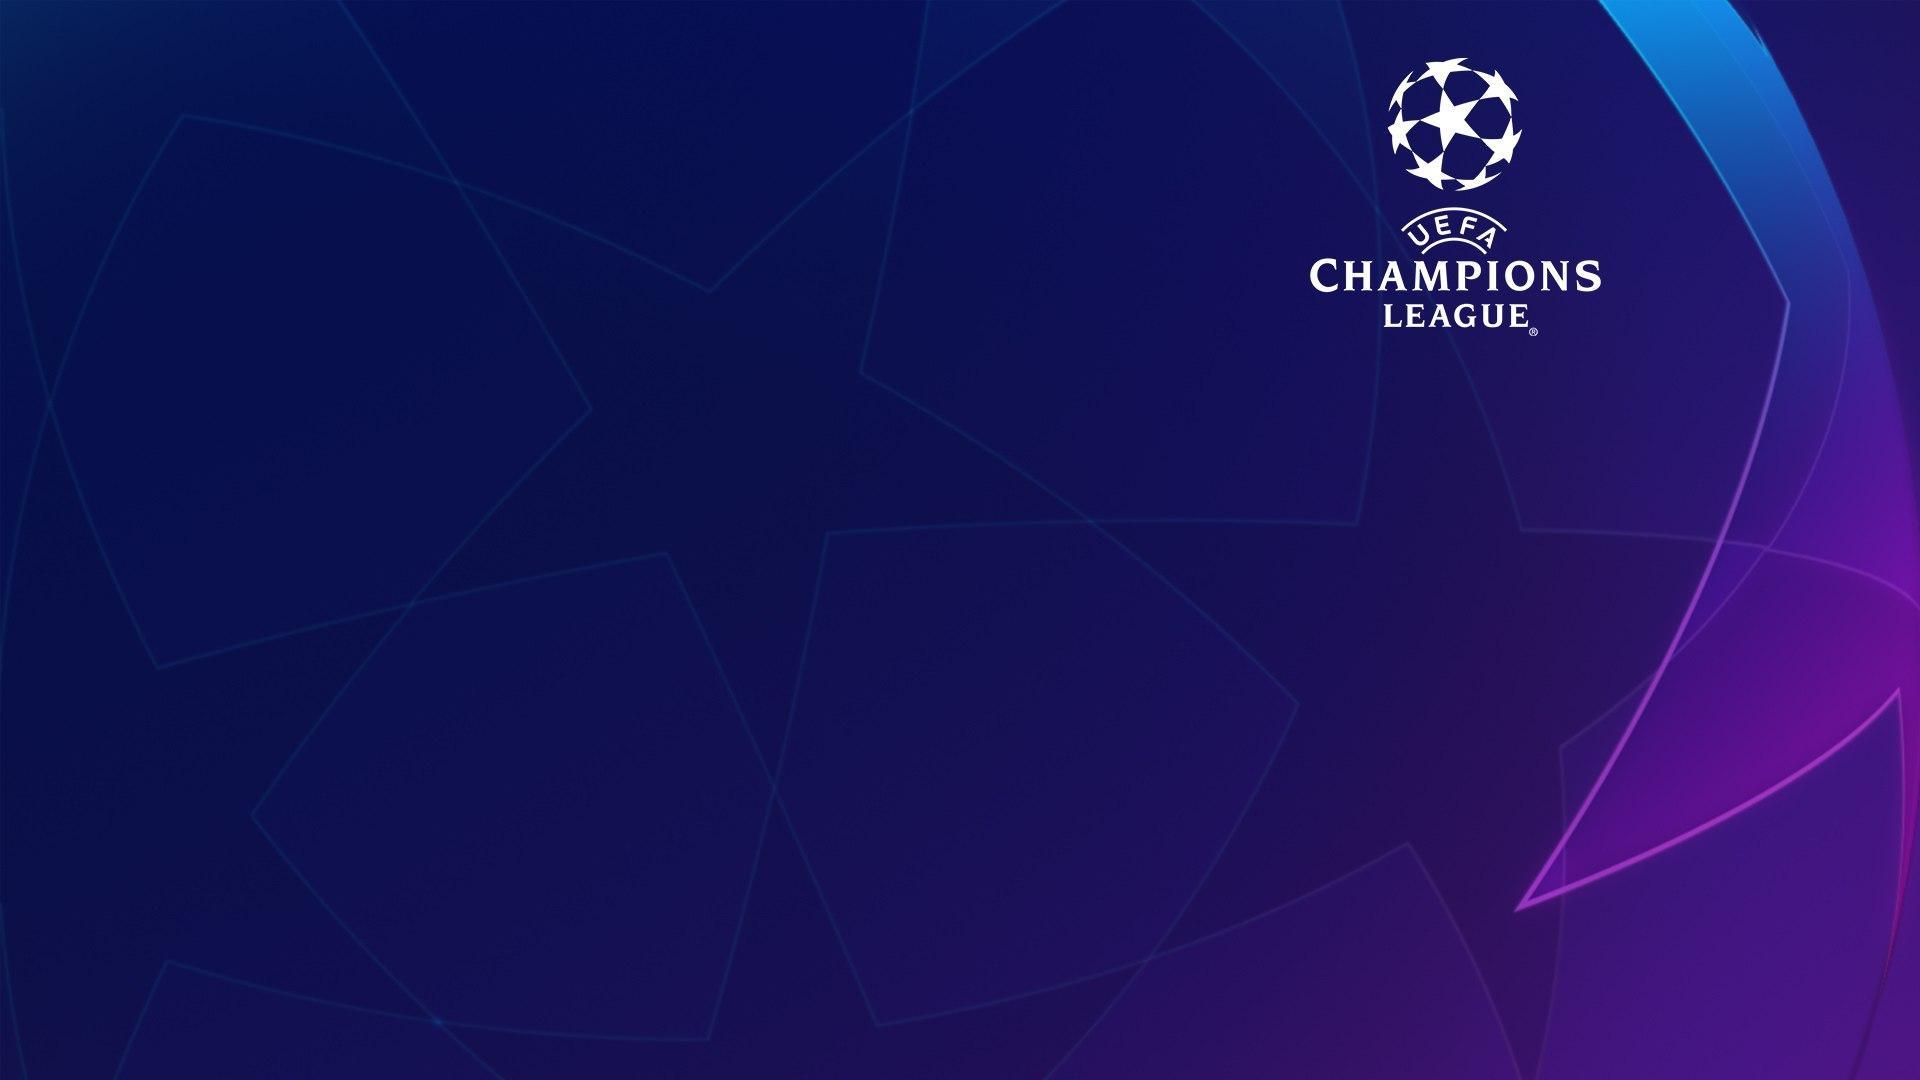 Sky Sport Football HD 5 x 5 Champions League